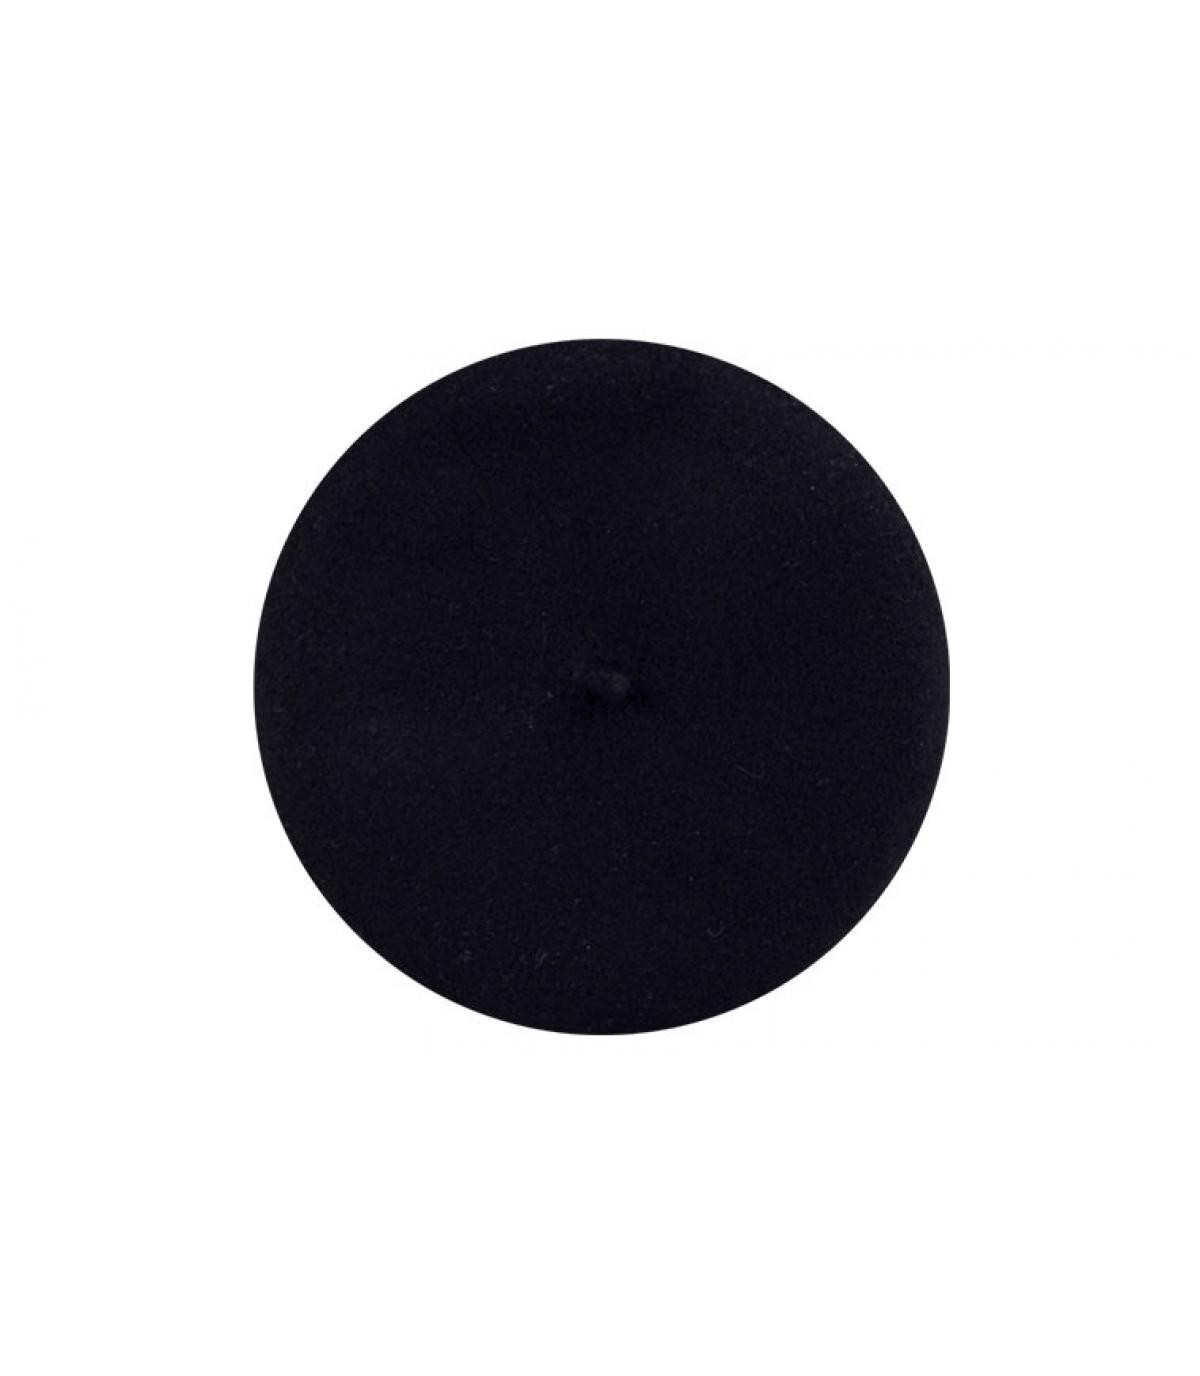 Black paris beret